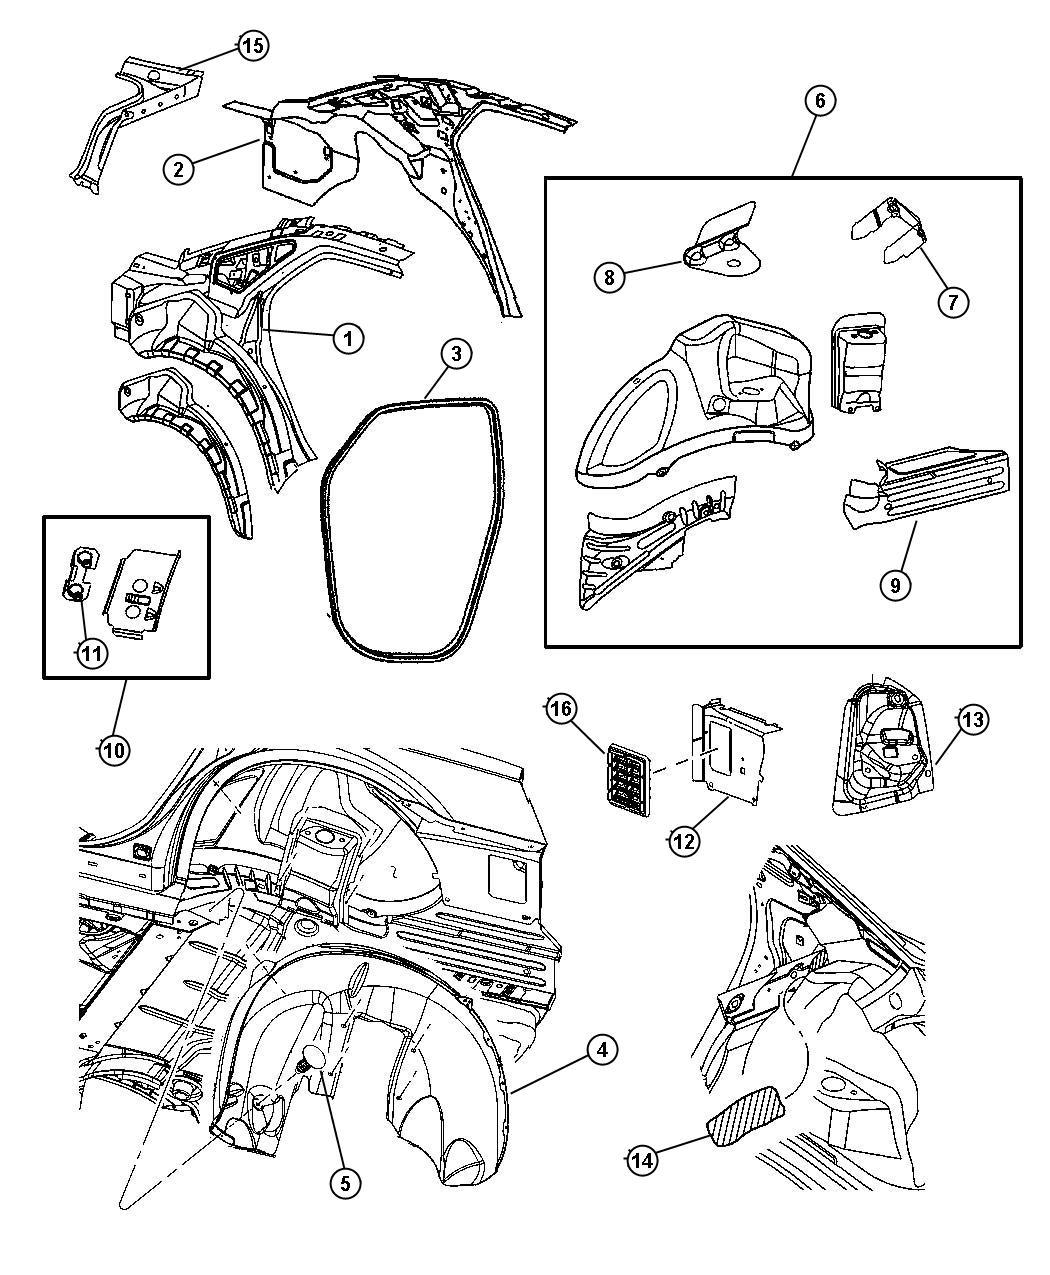 2007 Chrysler 300 Panel. Taillamp mounting. Right. Quarter